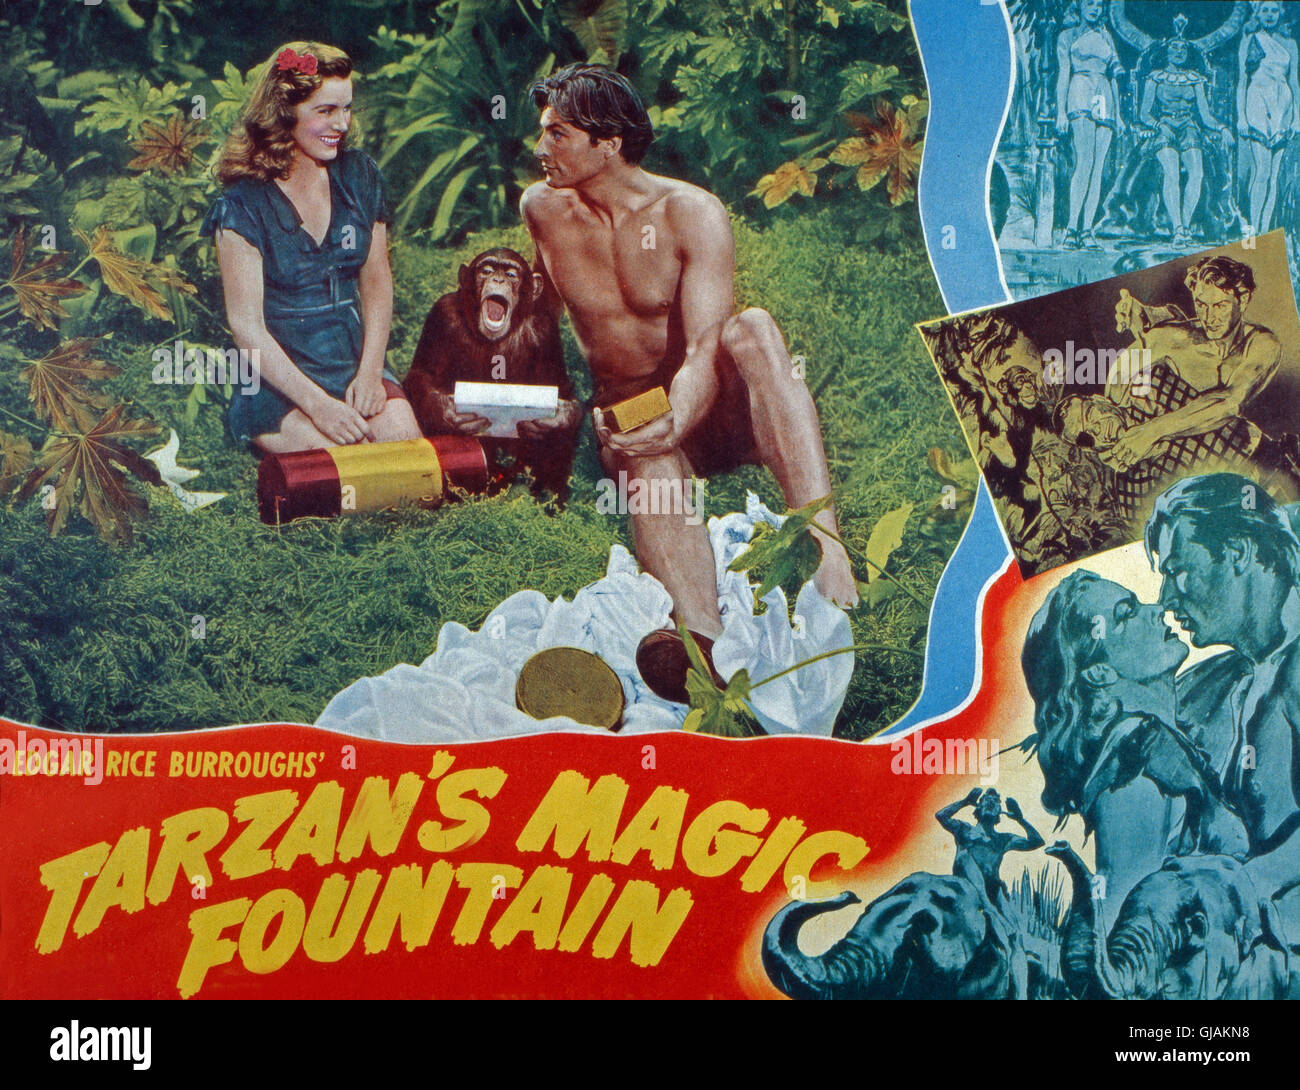 Tarzan's Magic Fountain, aka: Tarzan und das blaue Tal, USA 1949, Regie: Lee Sholem, Darsteller: Brenda Joyce, - Stock Image